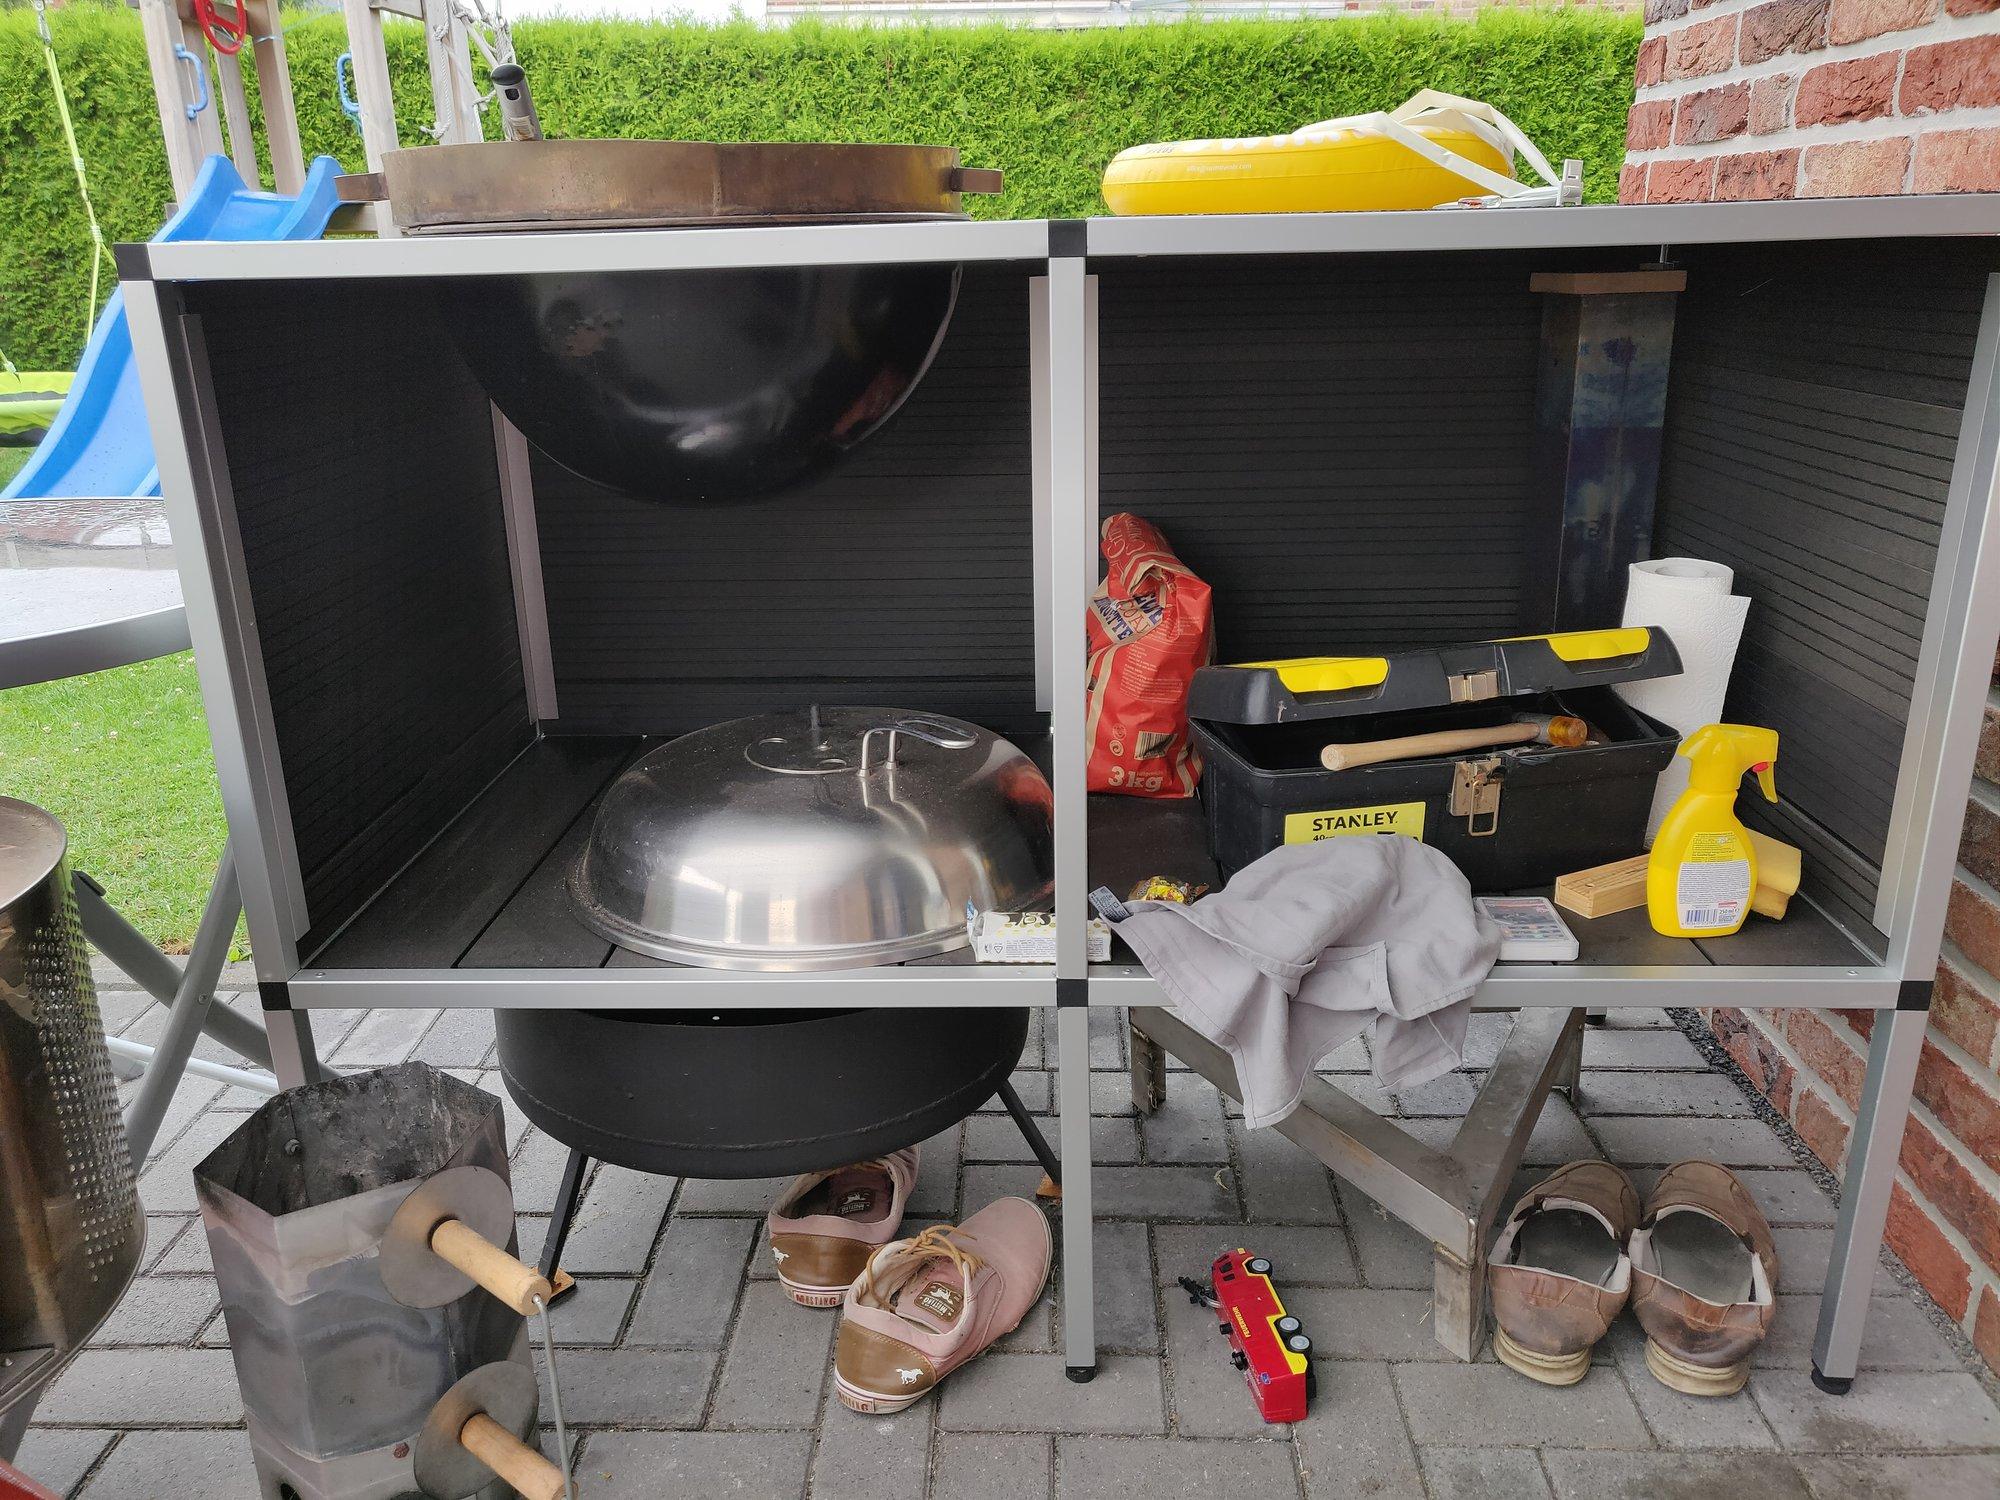 Outdoor Küche Dancook : Outdoor küche dancook dancook outdoor küche dancook holzkohle